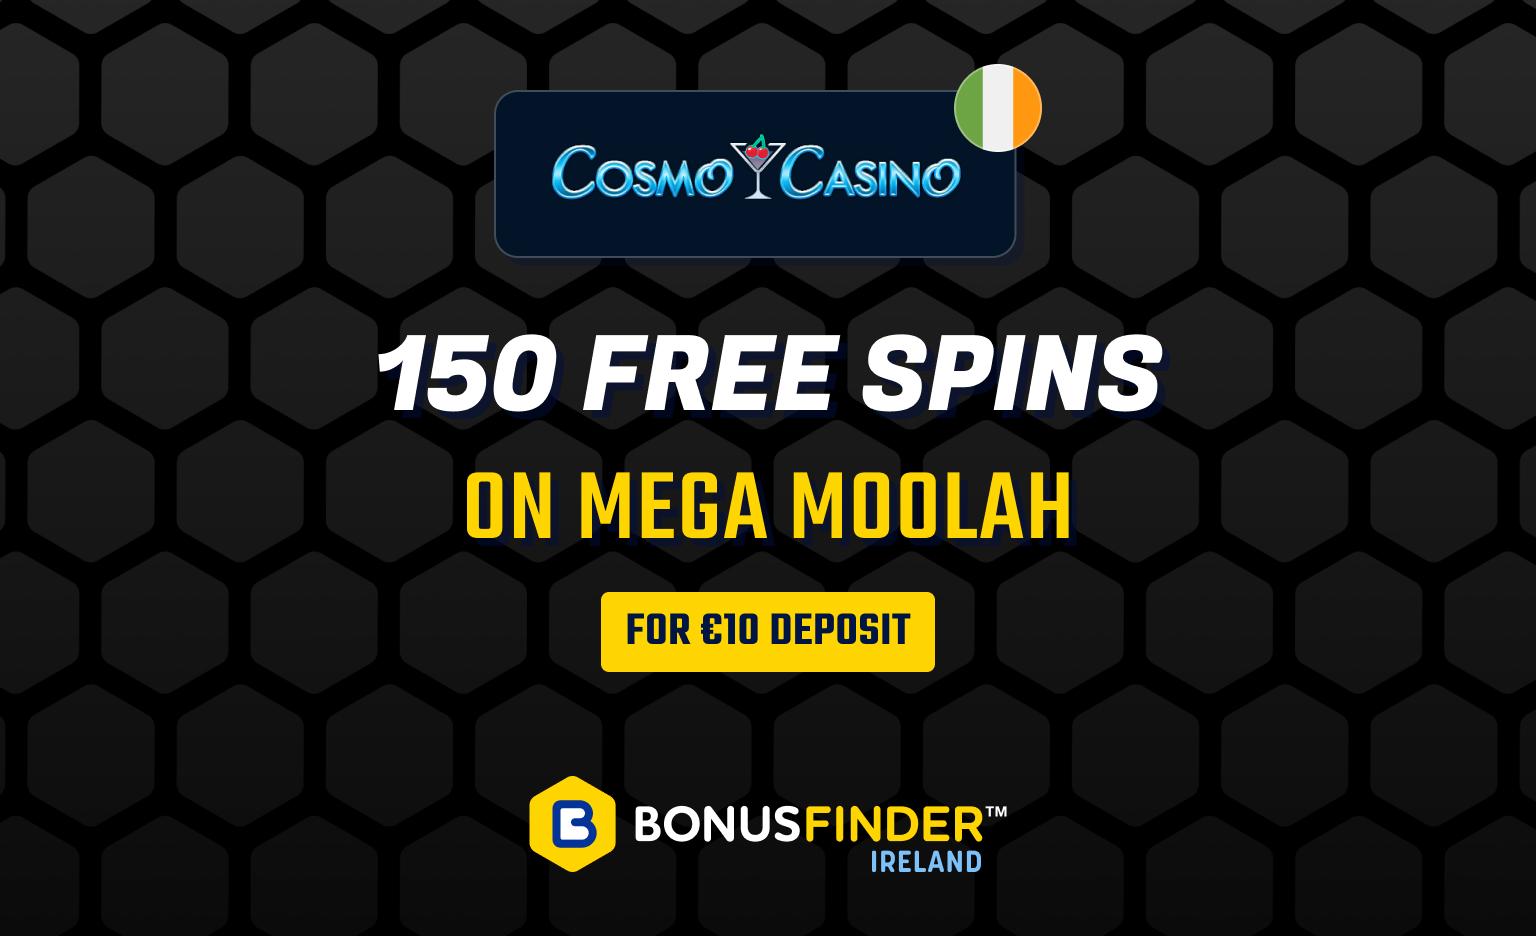 mega moolah casino sites